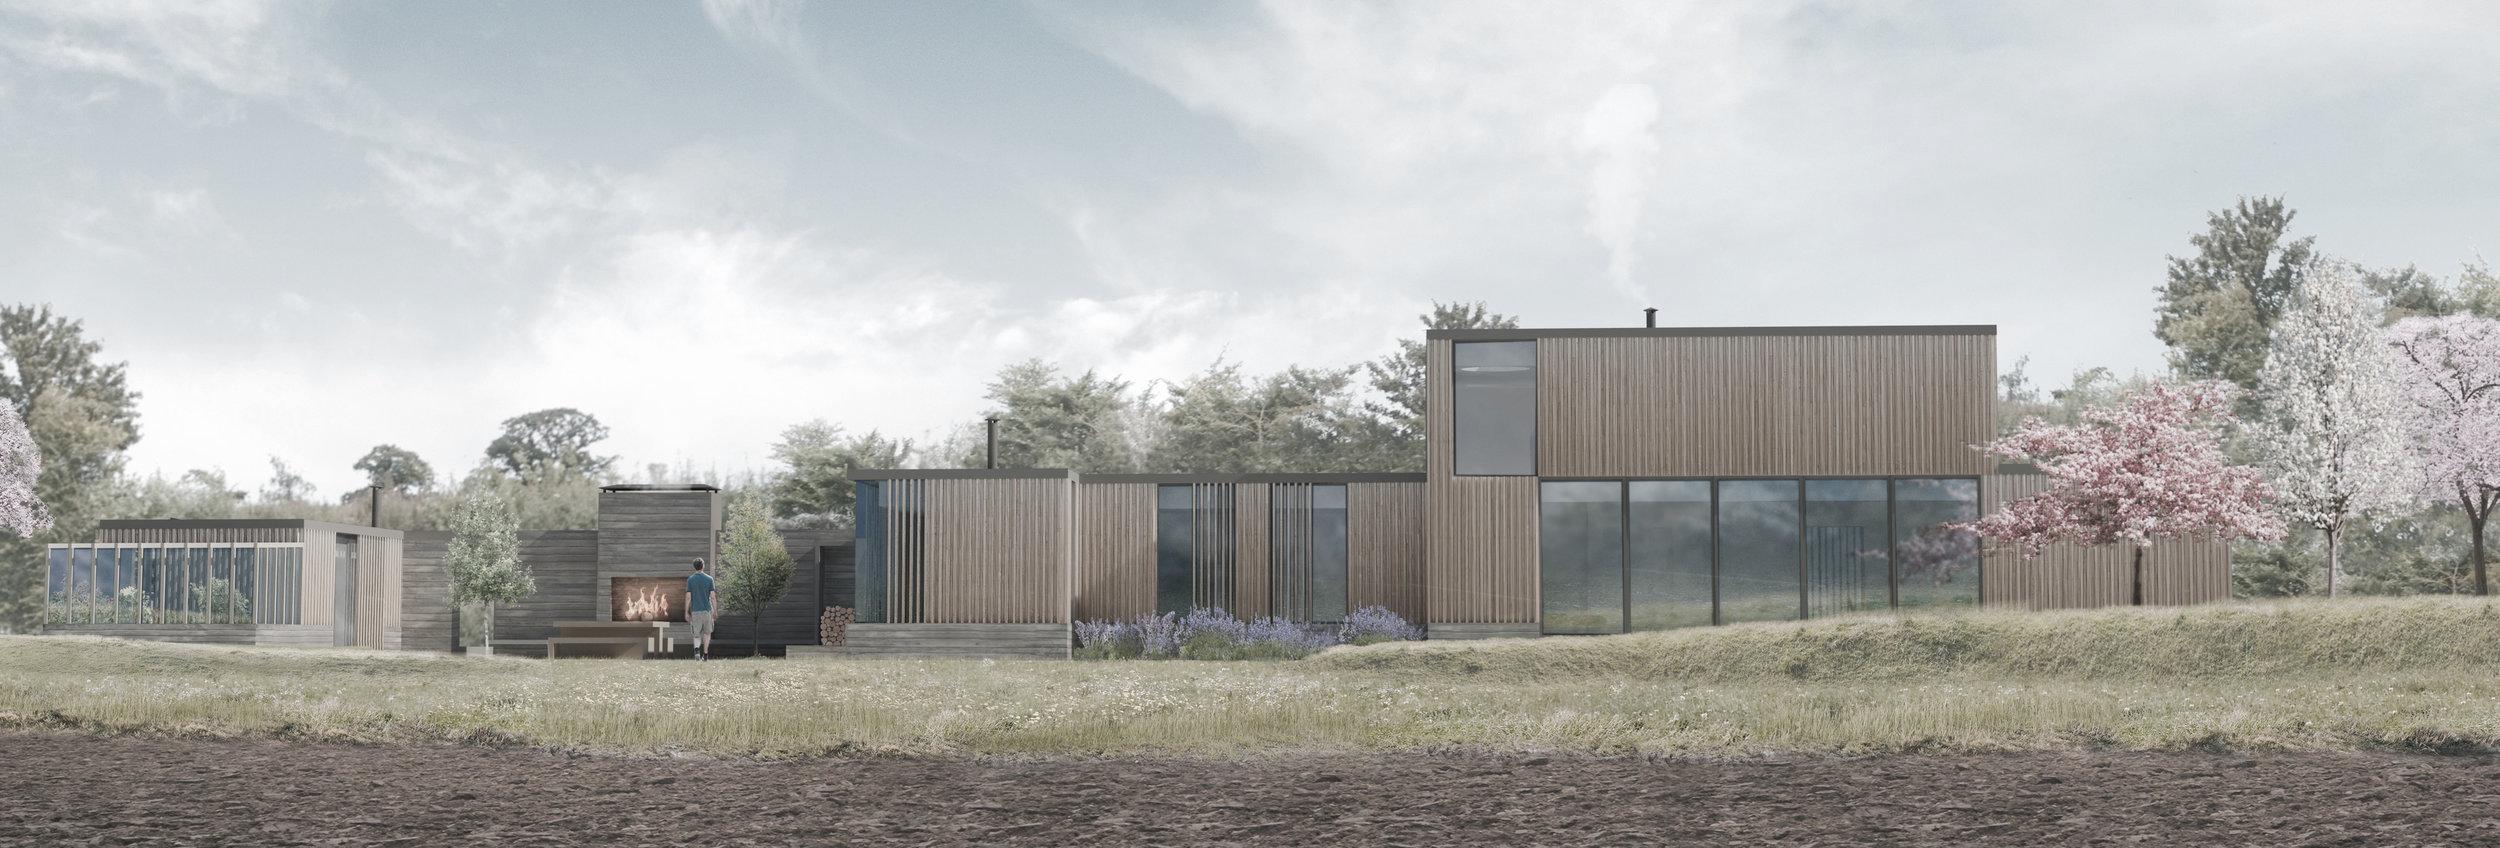 John Foat Architects - Architect Brighton, Southwold 7